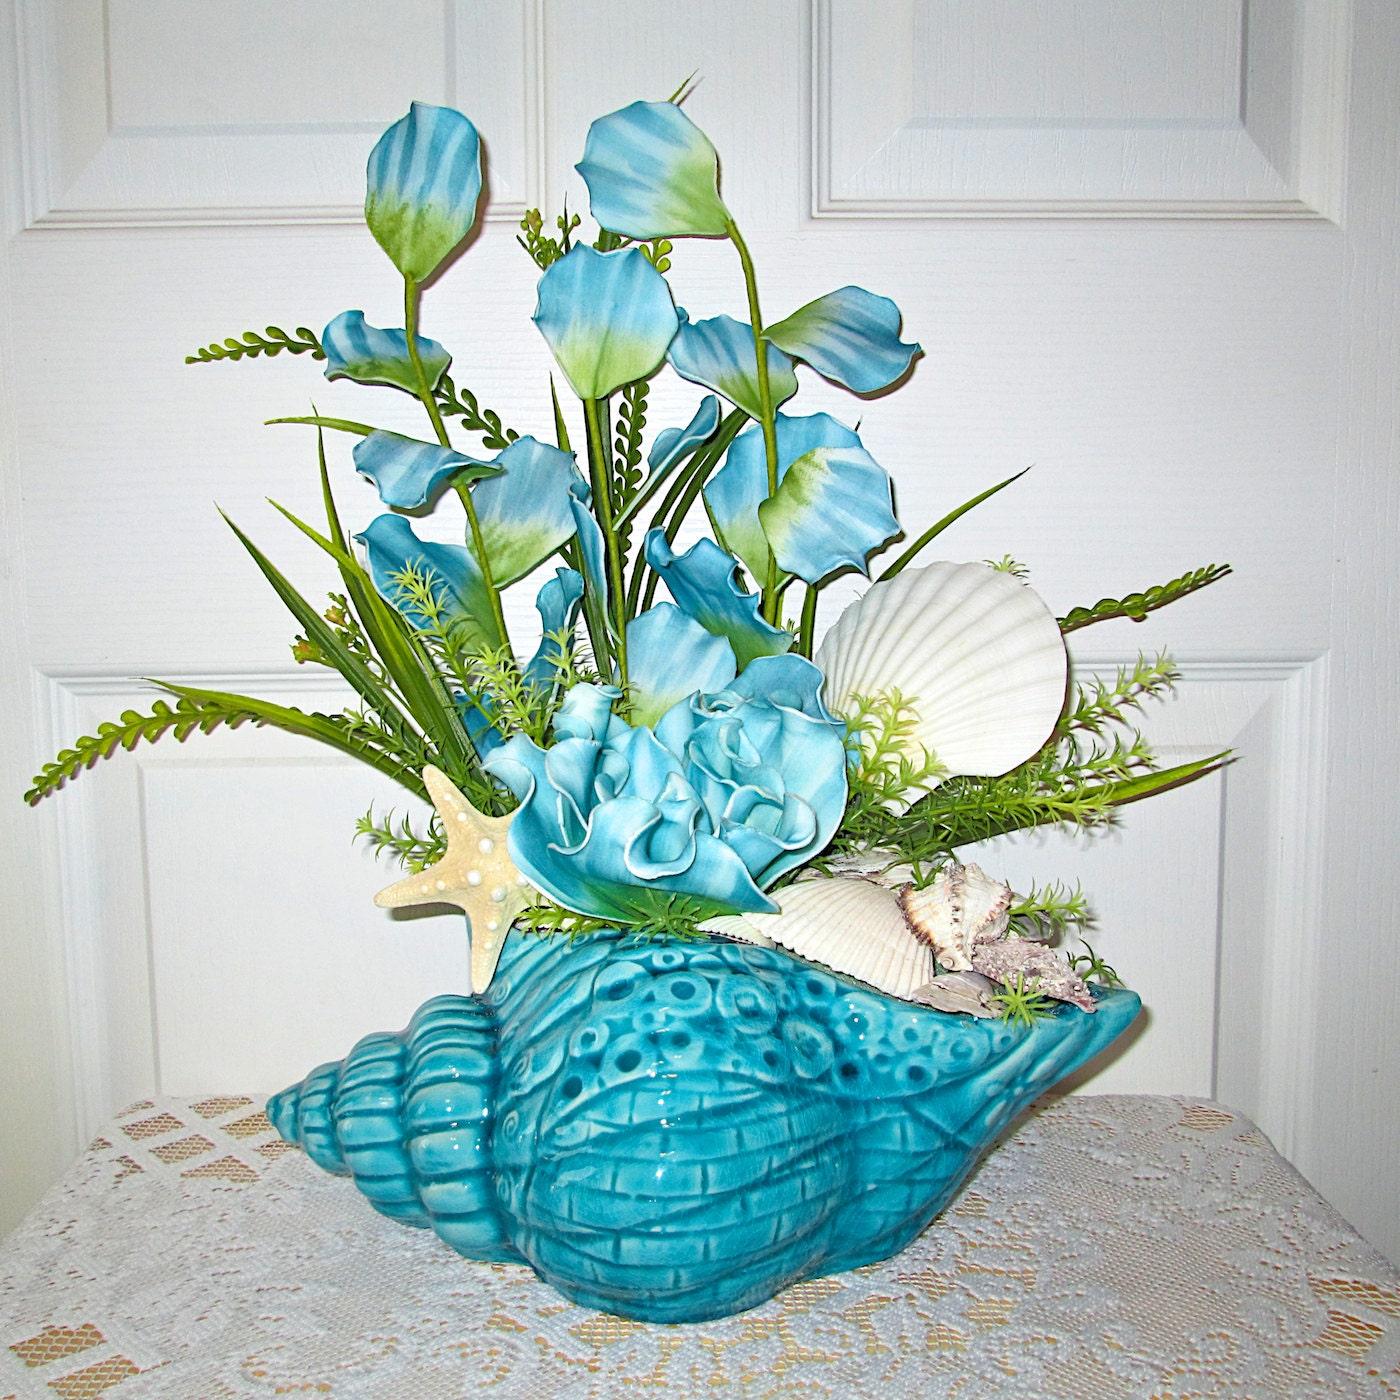 Aqua Sea Shell Flower Arrangement Home Decor Floral